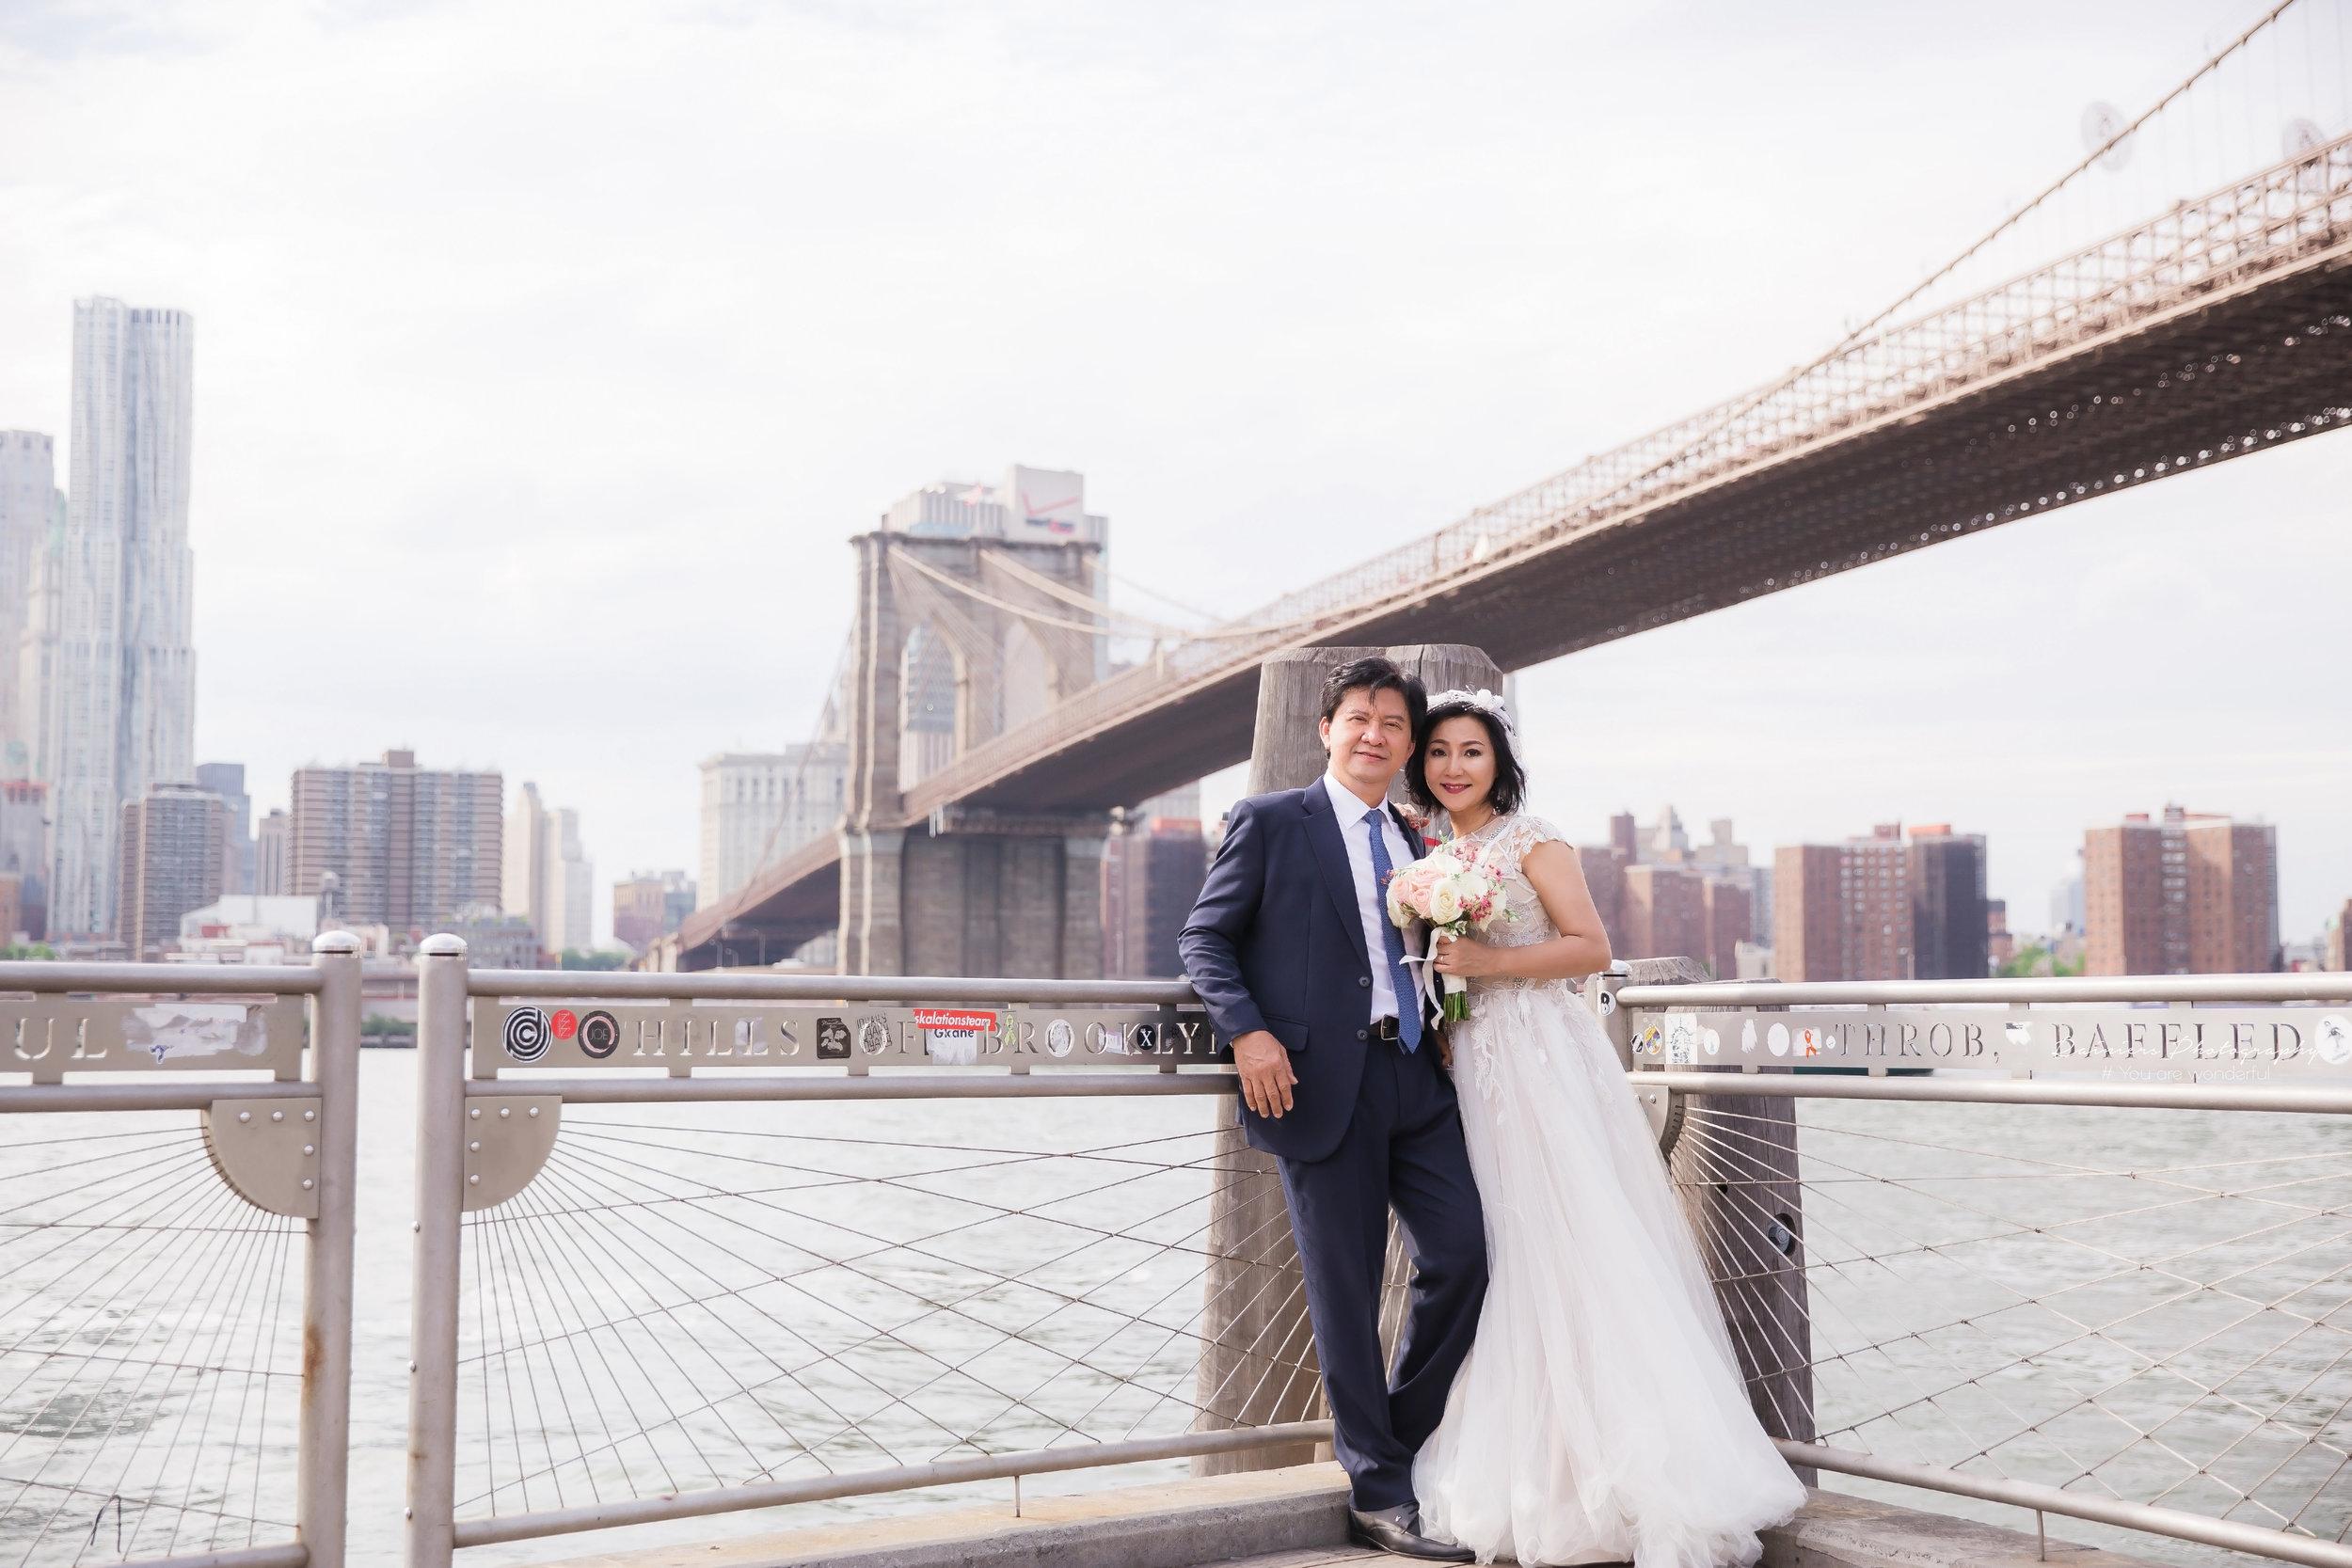 Elijah & Theresa - Wedding